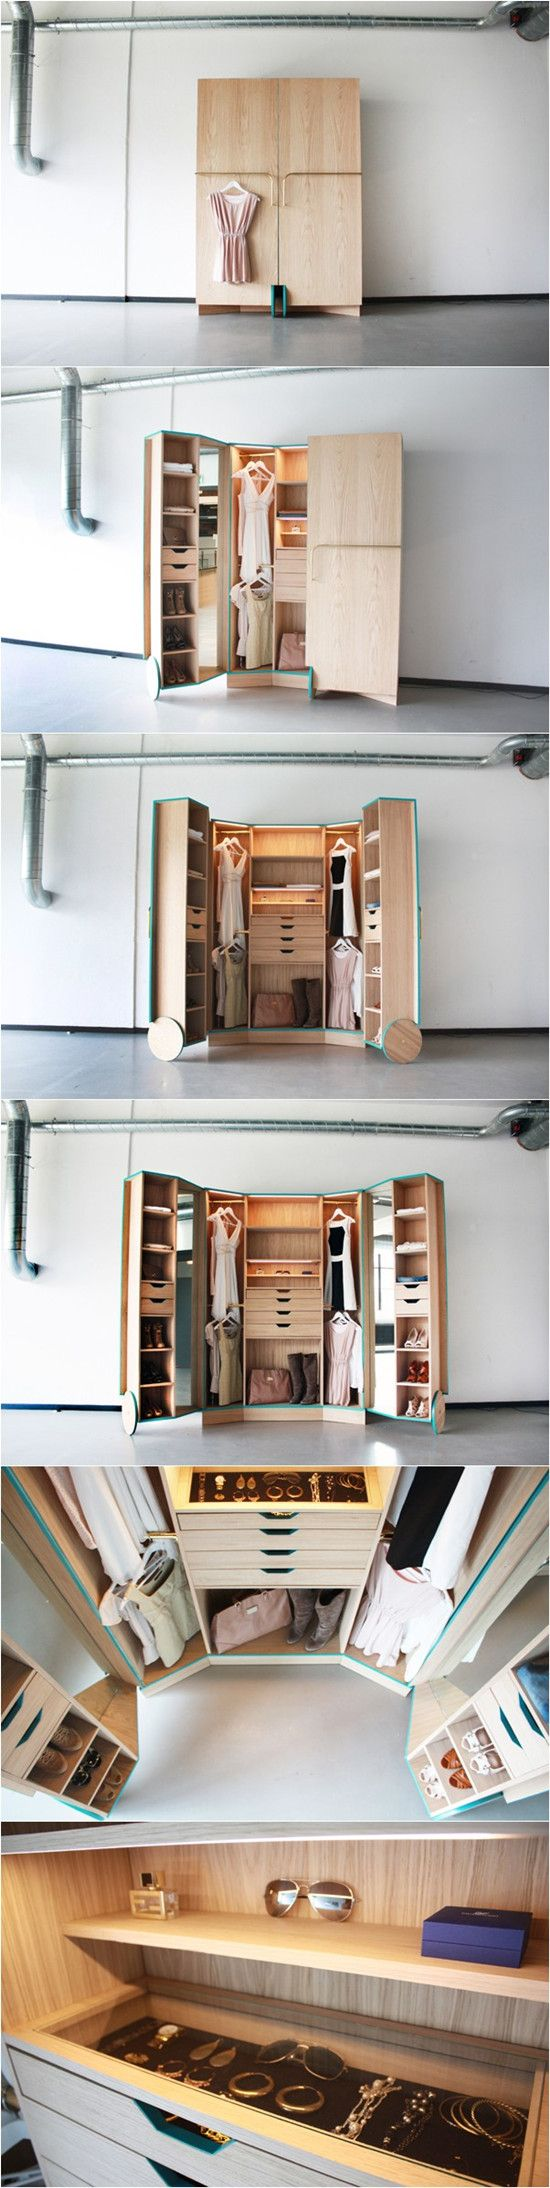 The standard wardrobe a depth of 60 cm